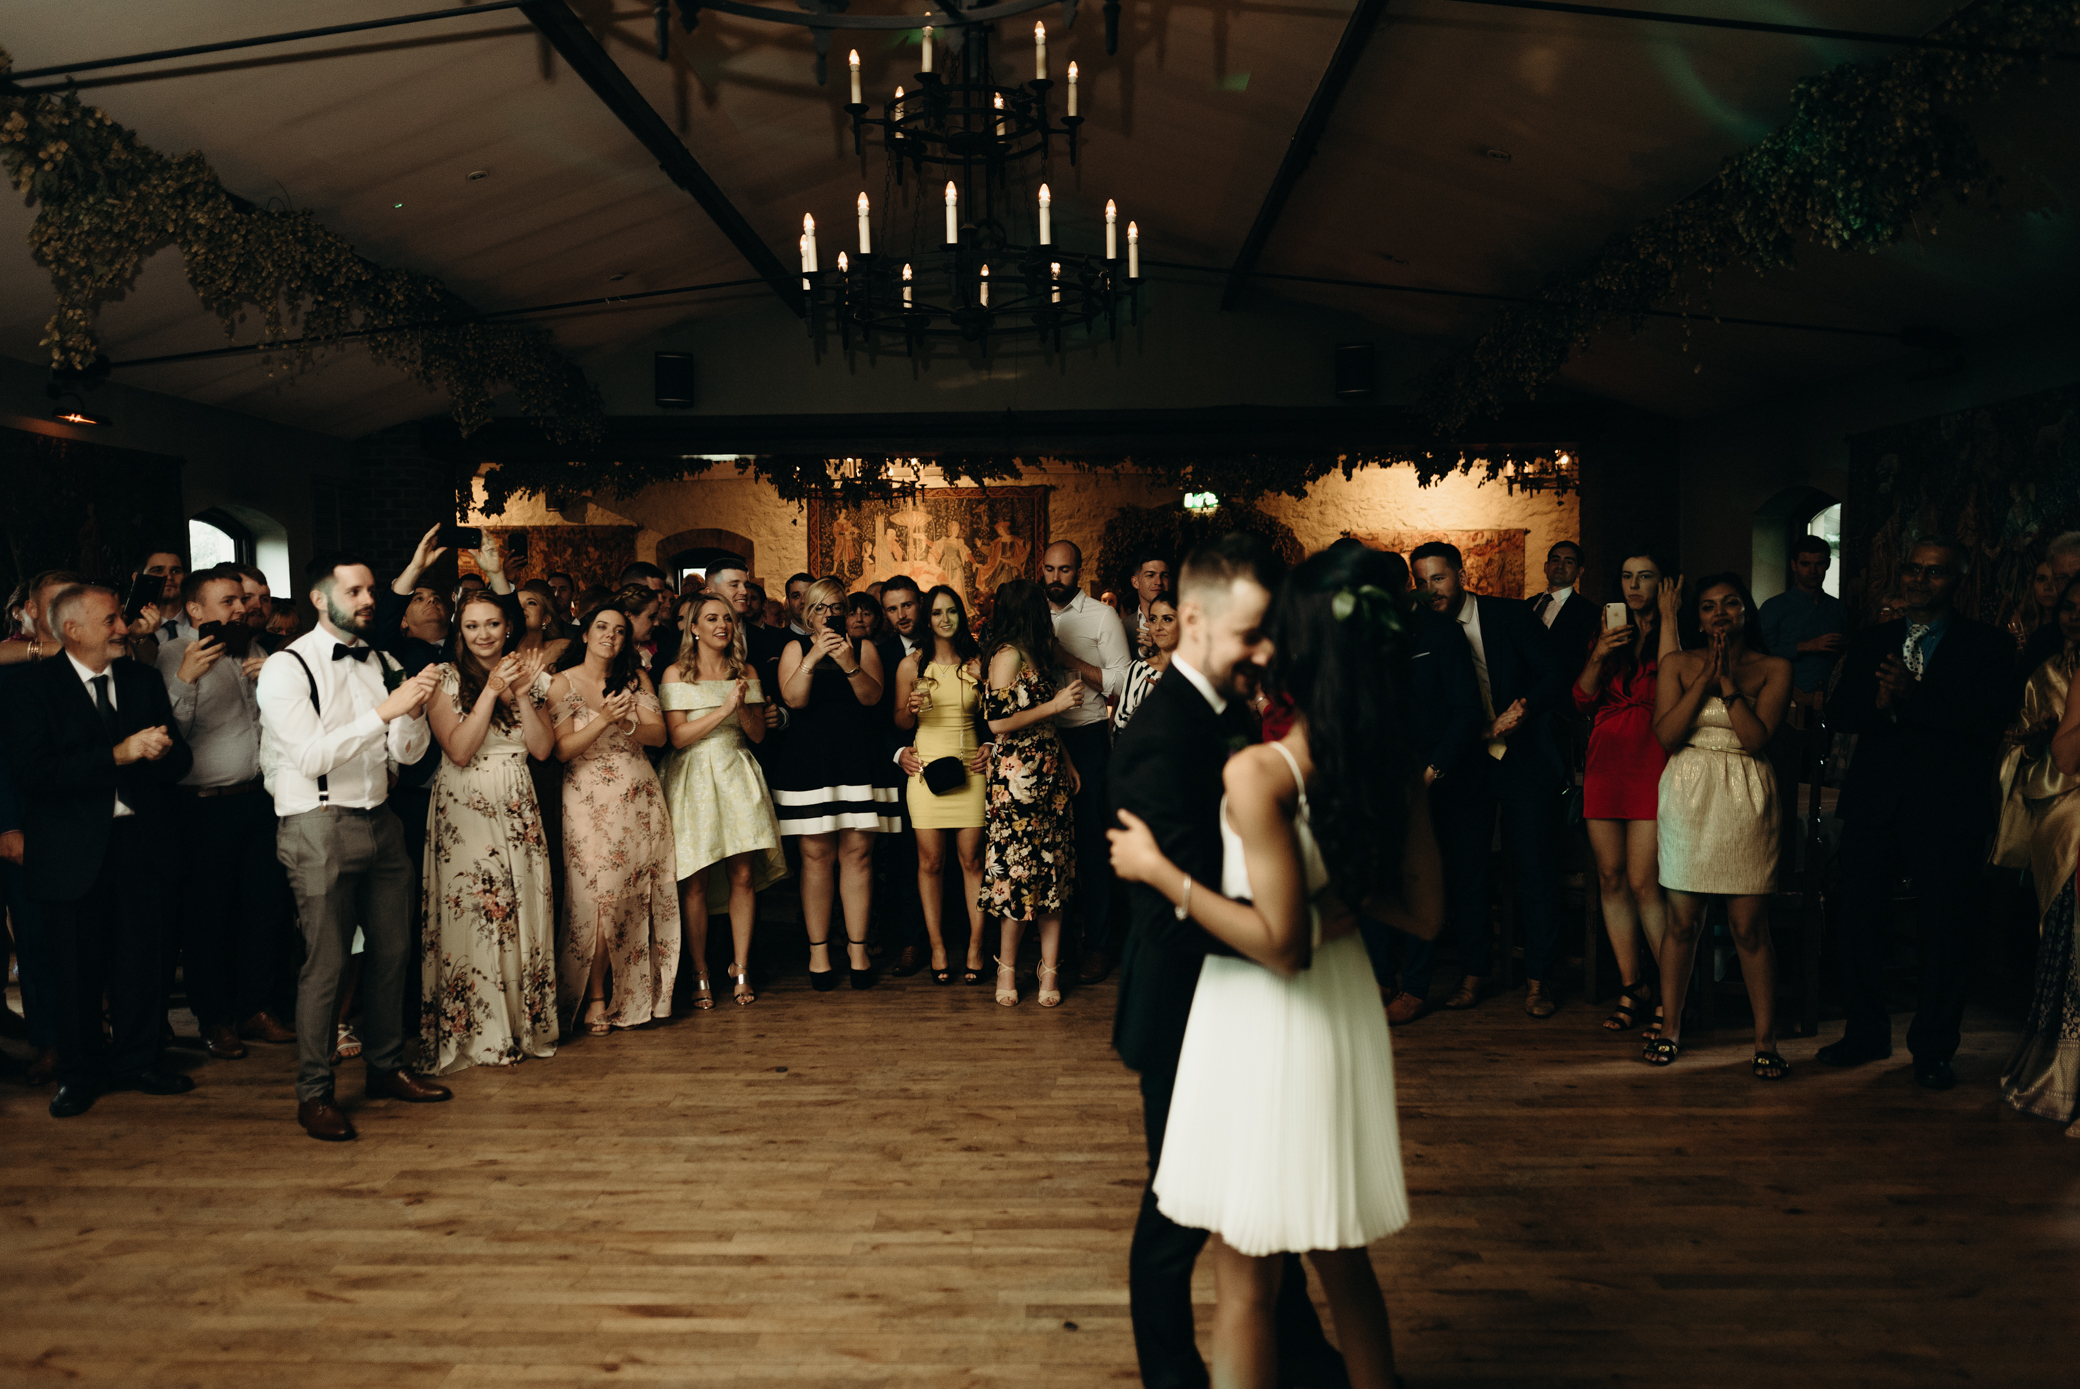 Alan&Naz- Barberstown Castle Wedding - Wedding photographer Ireland-204.jpg